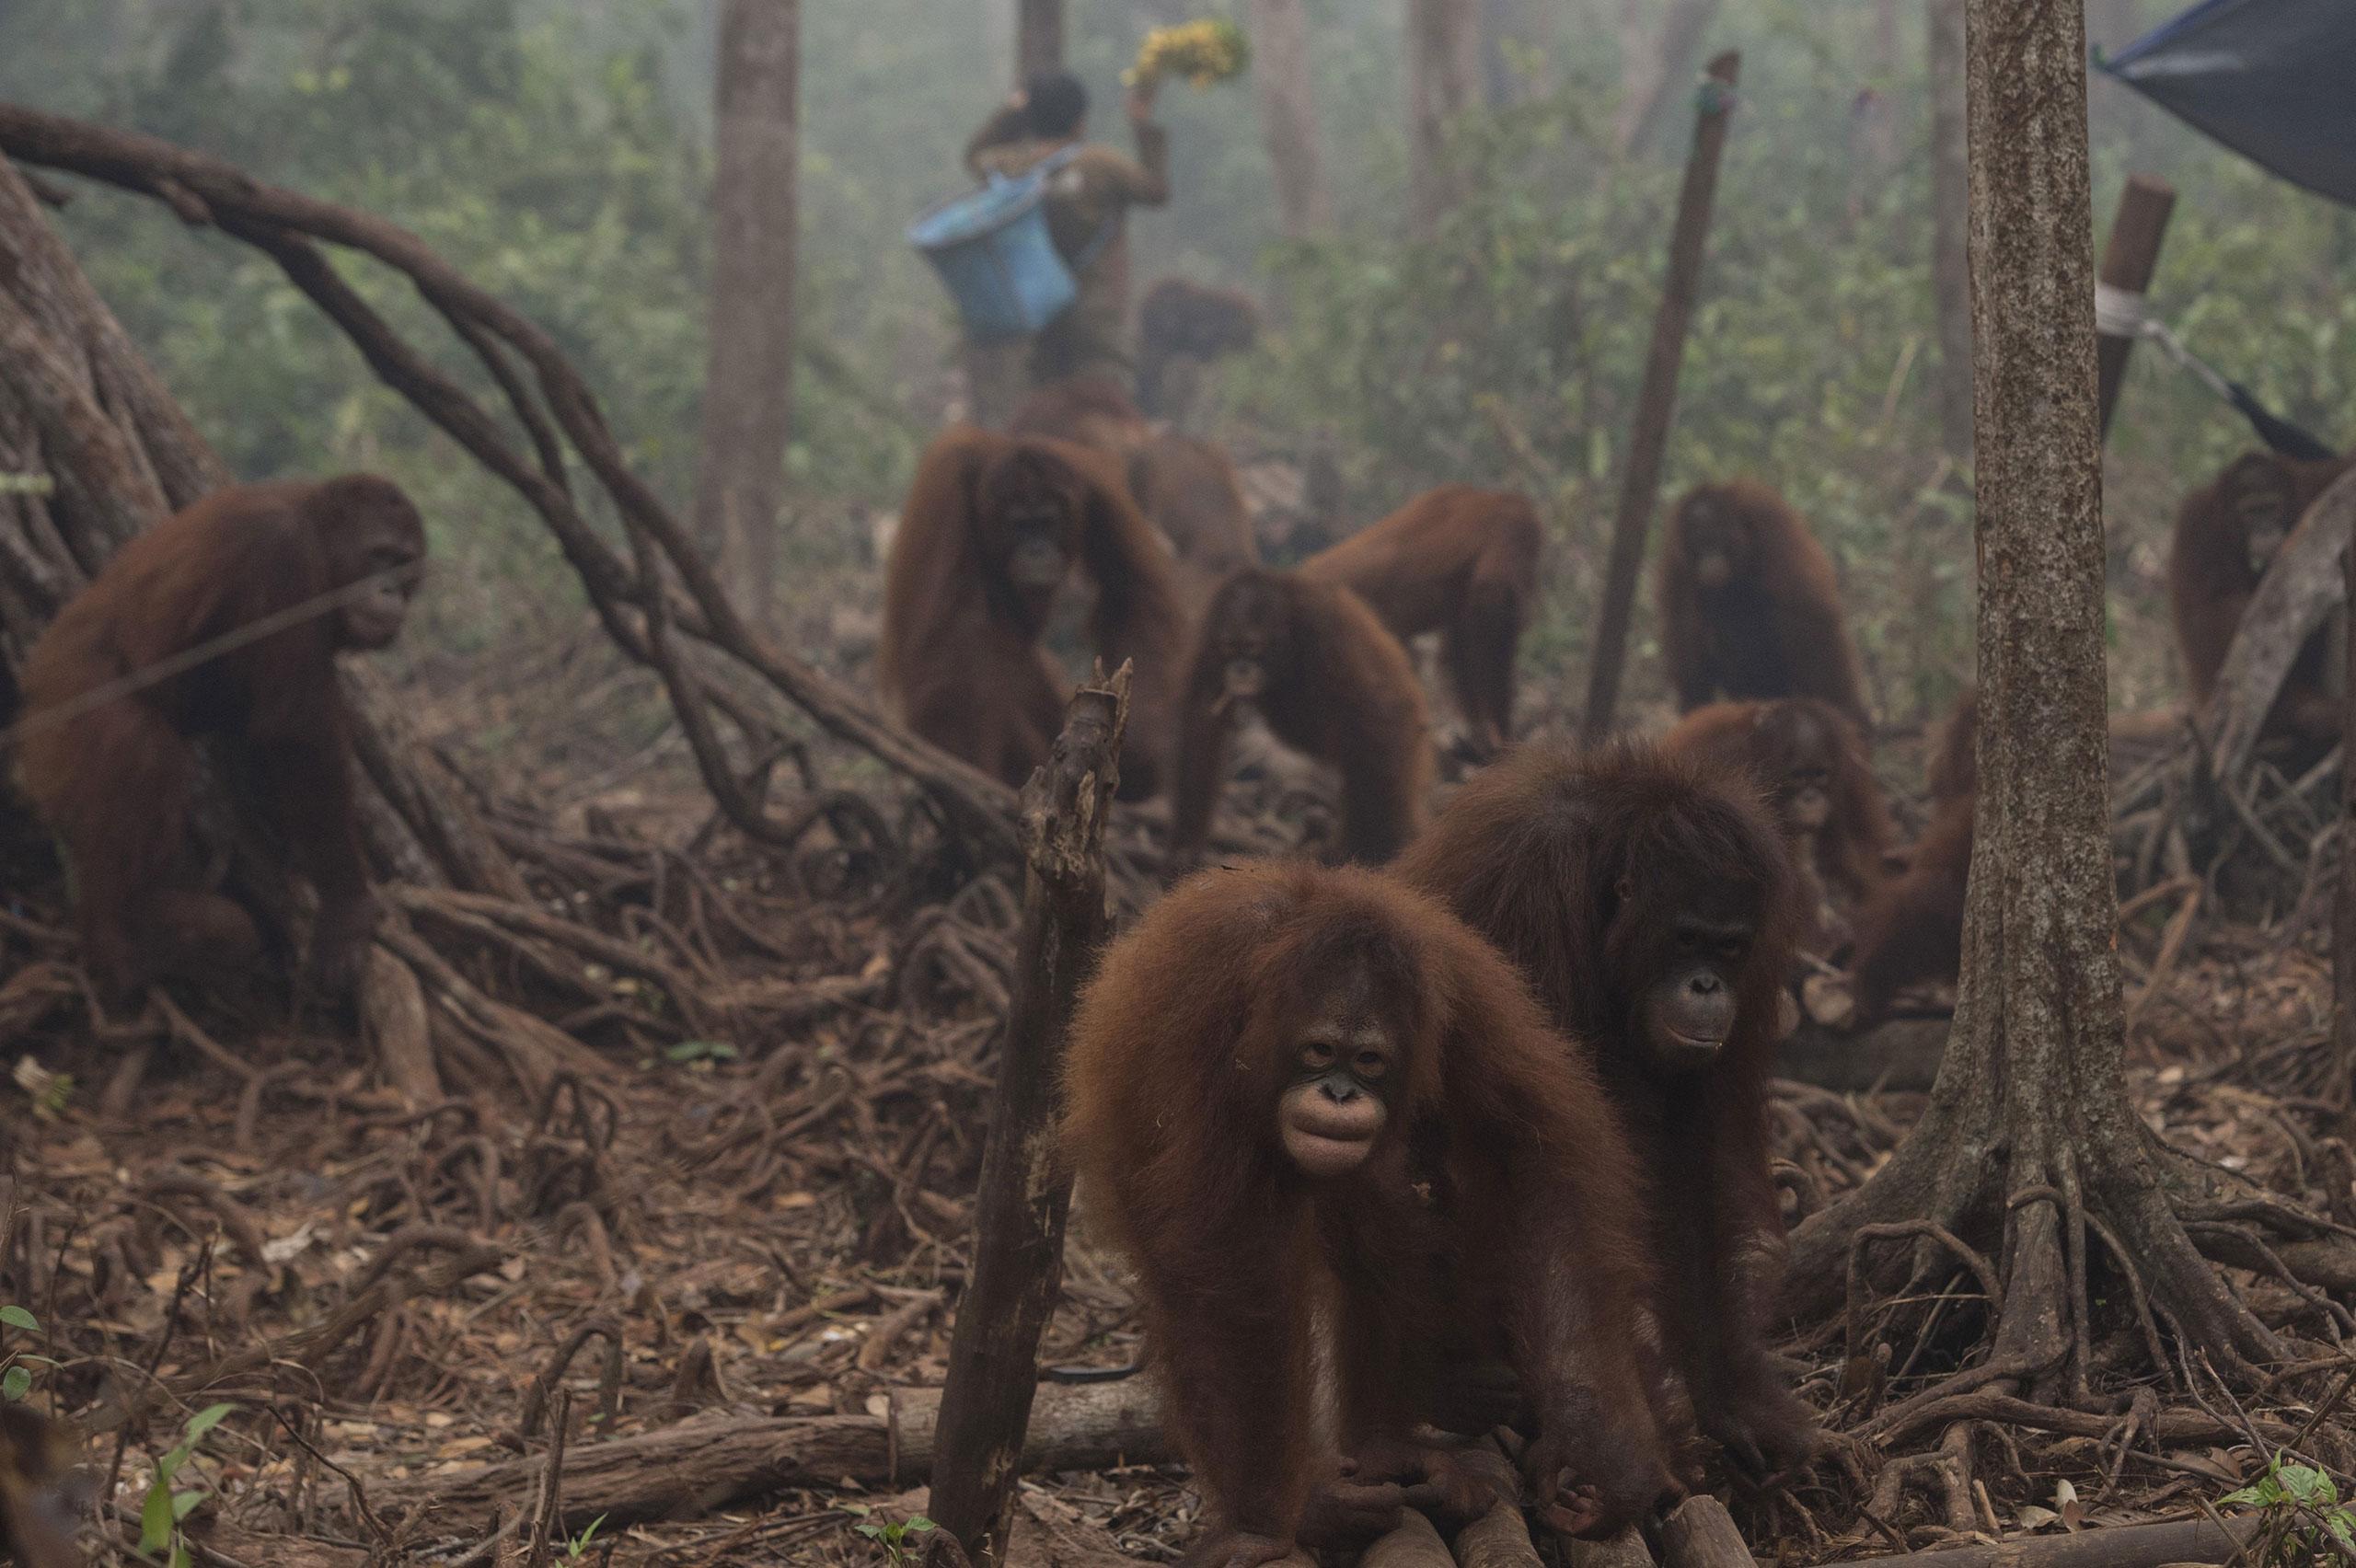 Orangutans walk as haze shrouds Borneo Orangutan Survival Foundation camp in Nyaru Menteng, Indonesia's Central Kalimantan province, Oct. 5, 2015.